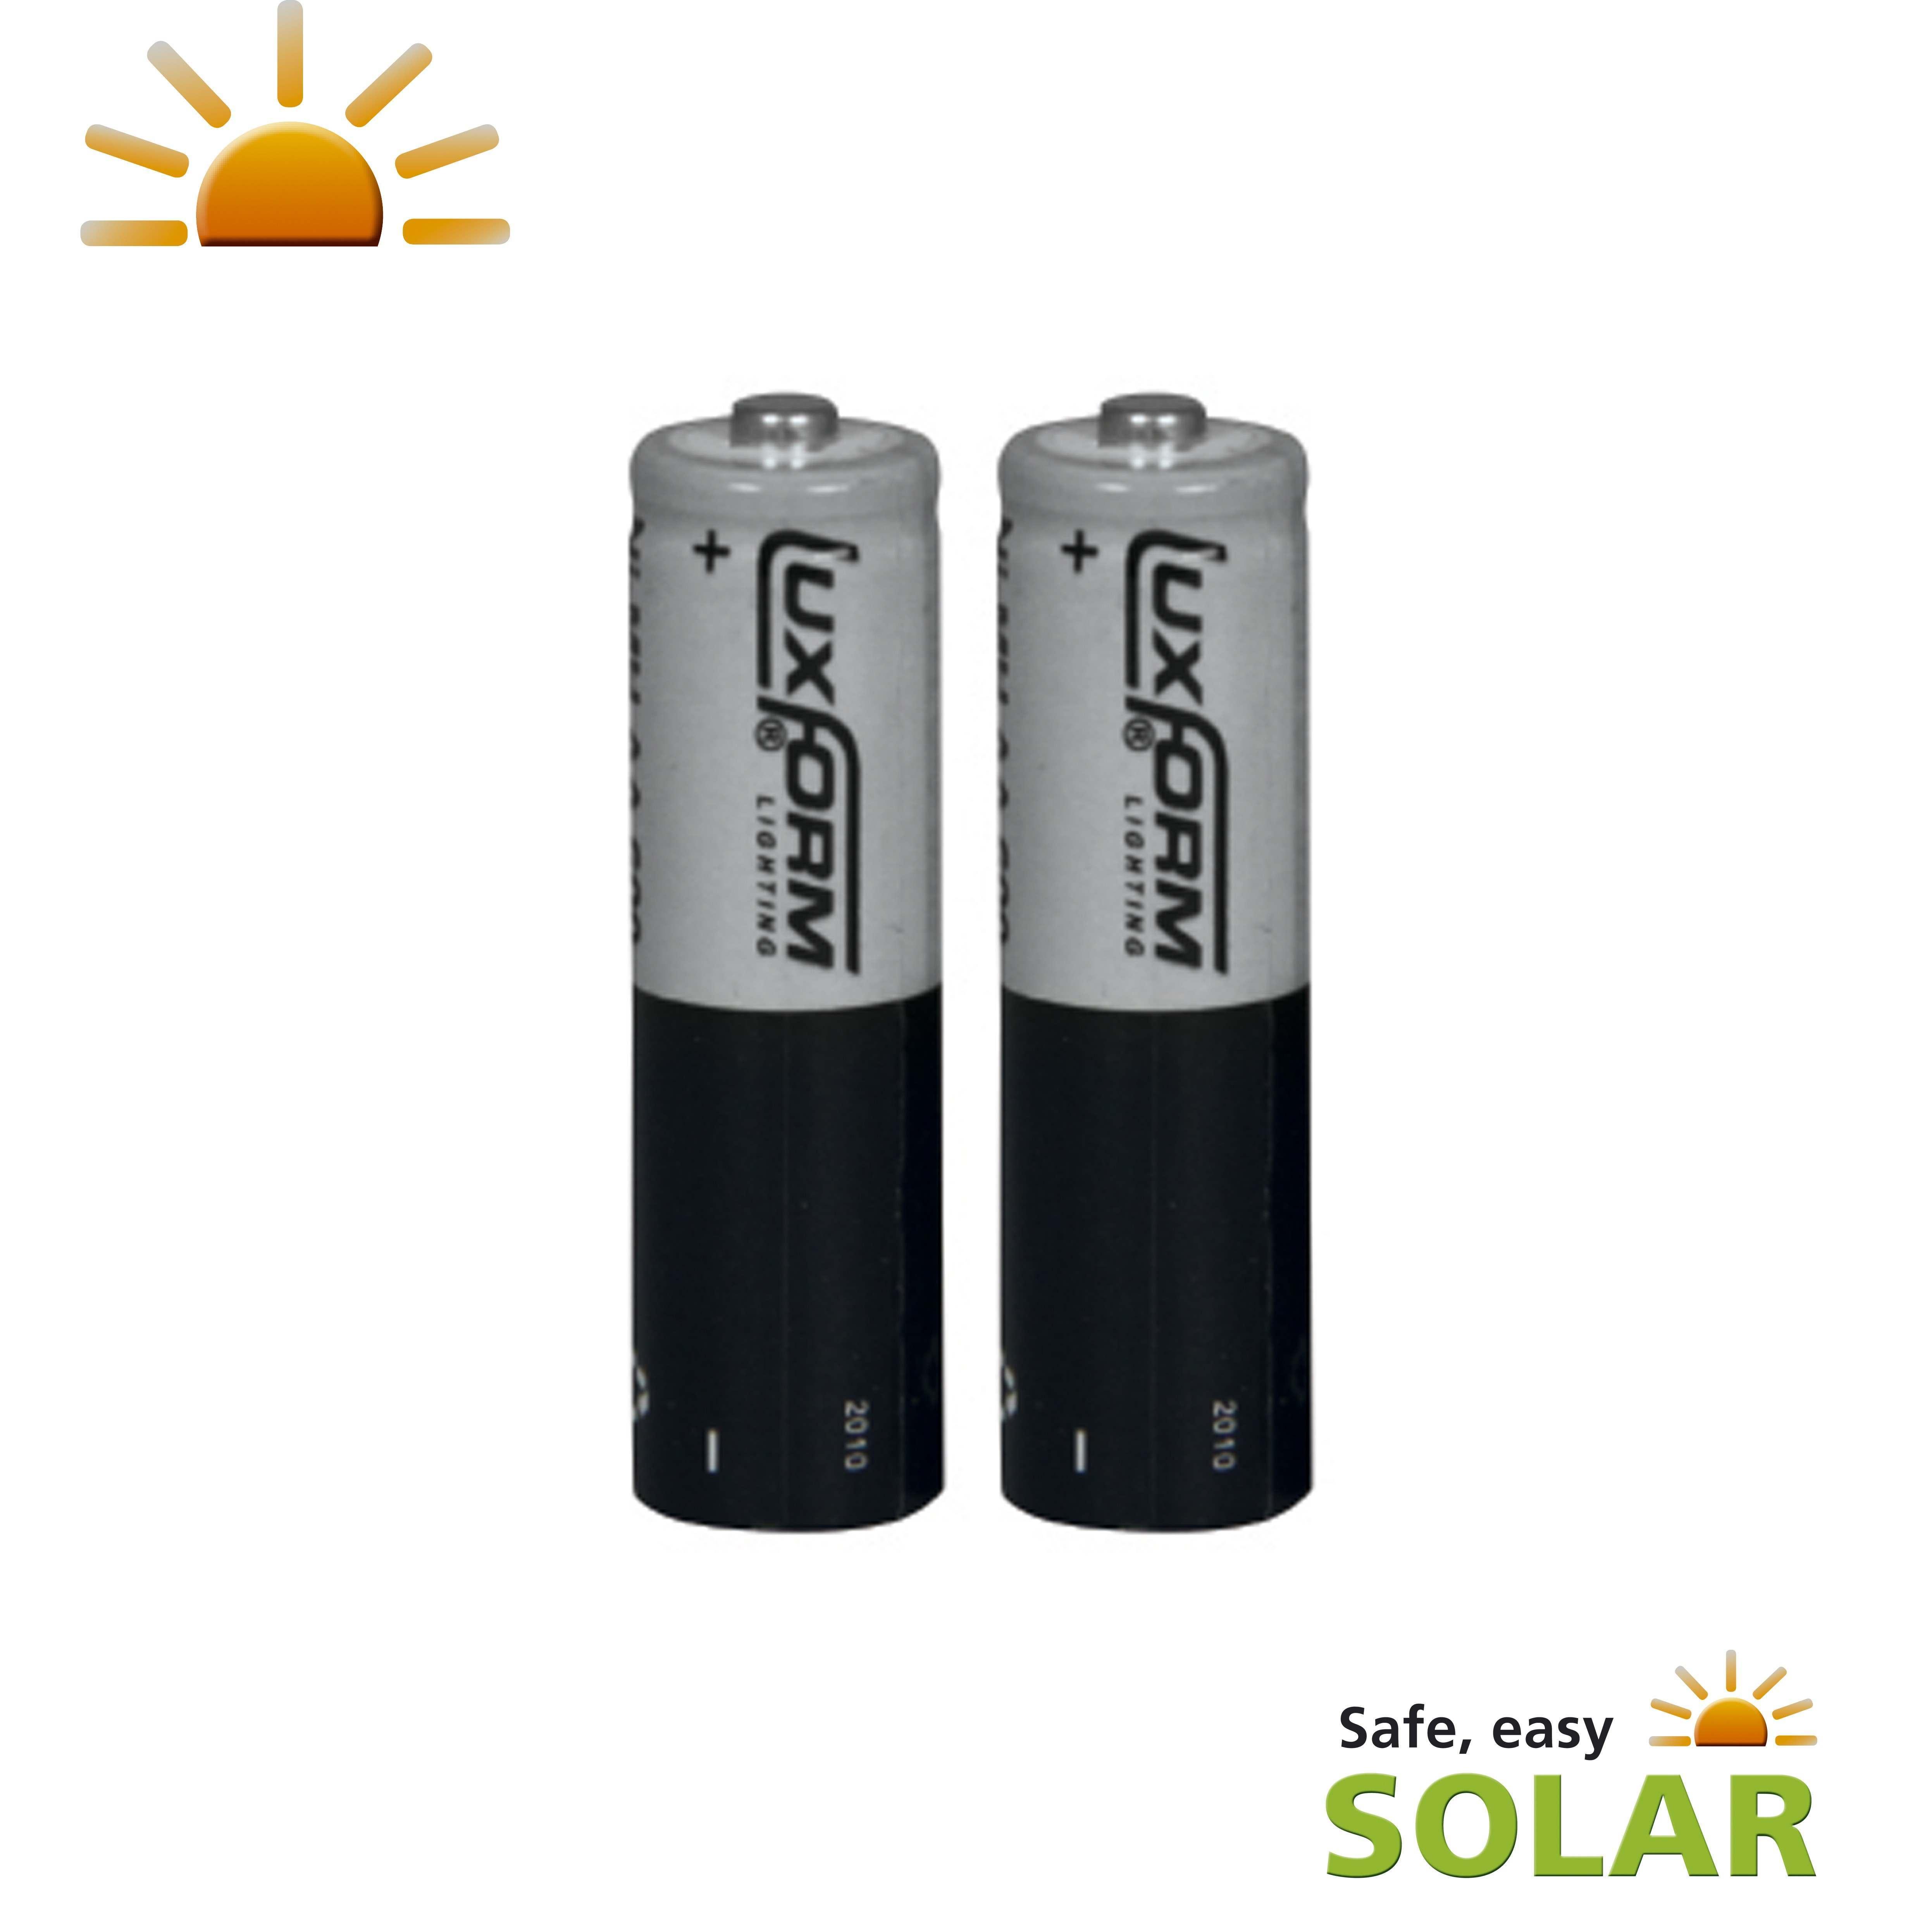 Luxform Solar Rechargeable AA Li-ion 600 mAh Batteries, 3.2V, 2 Pack